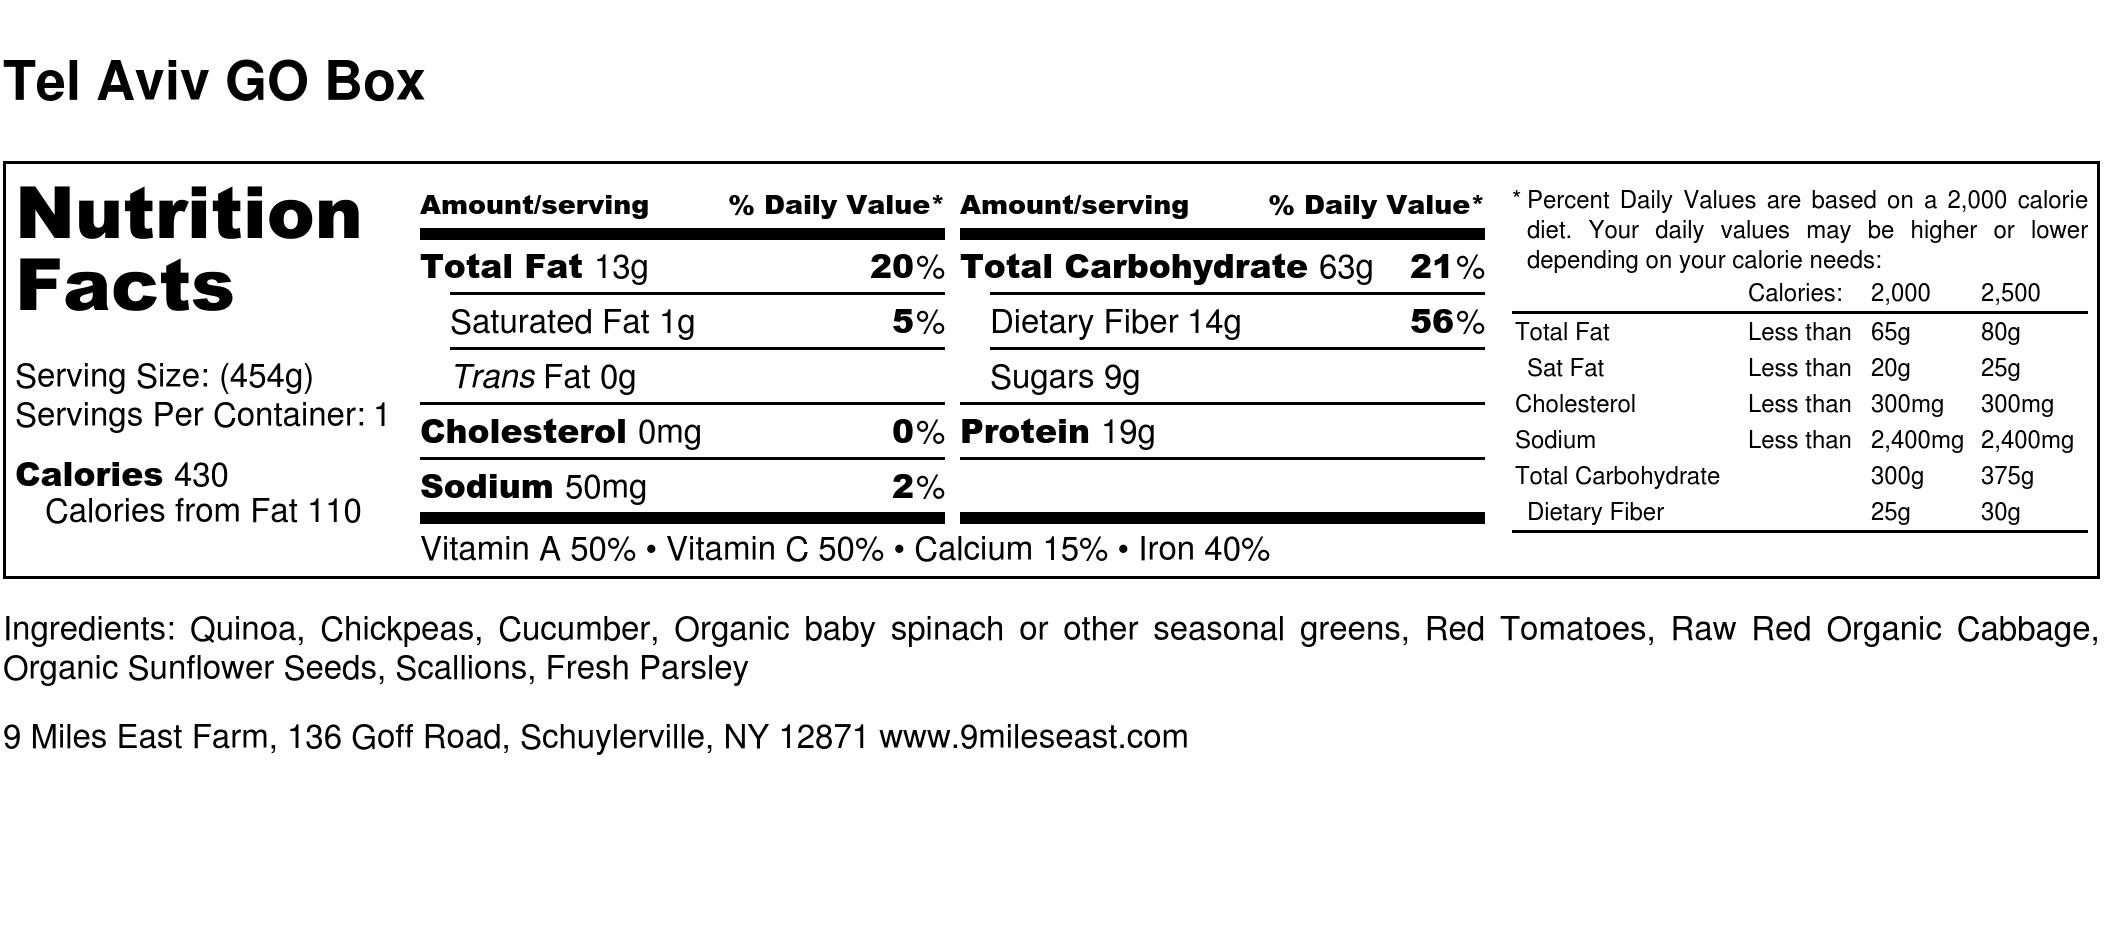 Tel Aviv GO Box - Nutrition Label.jpg